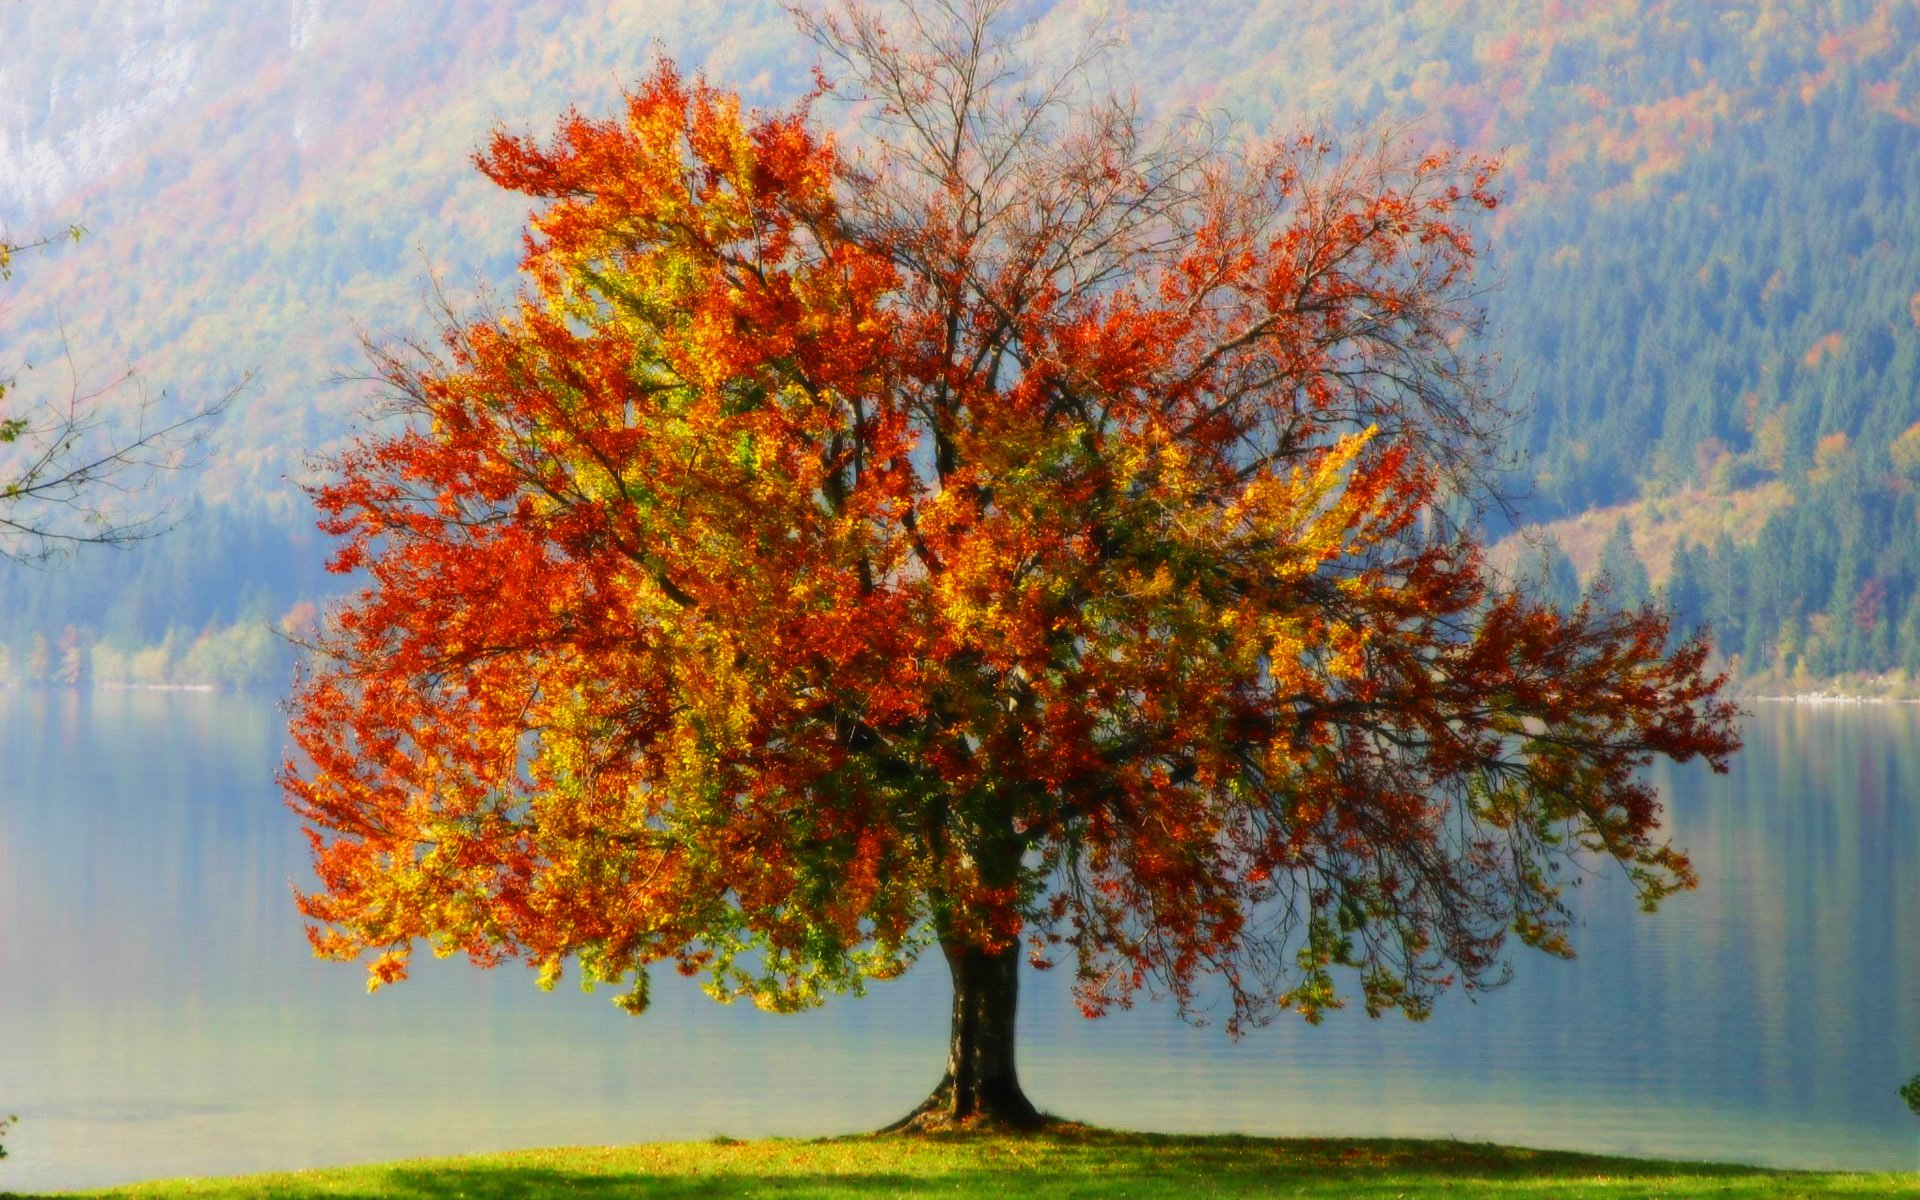 autumn fall tree backgrounds - photo #10